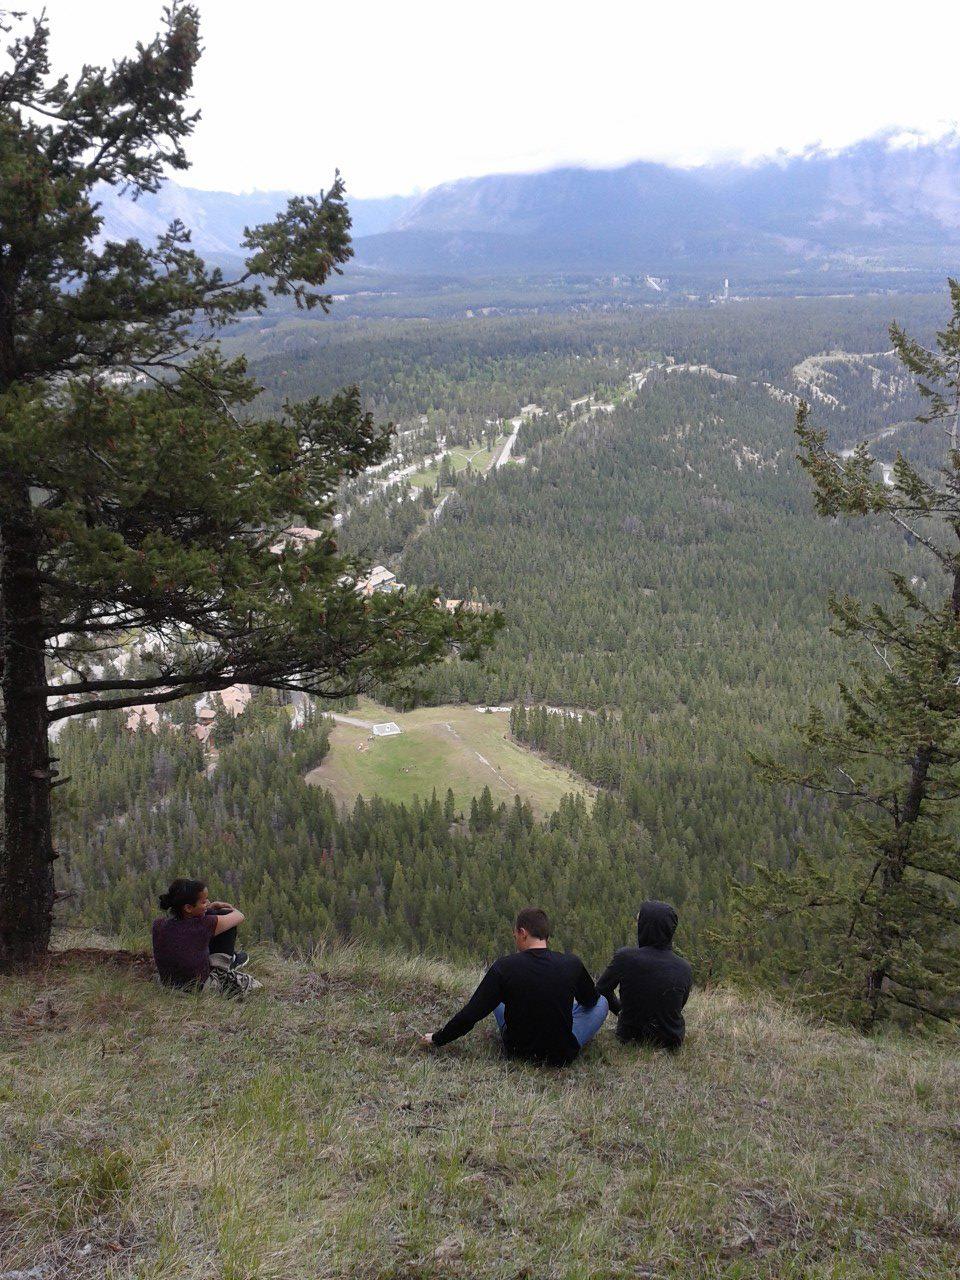 Toronto overlooking Banff